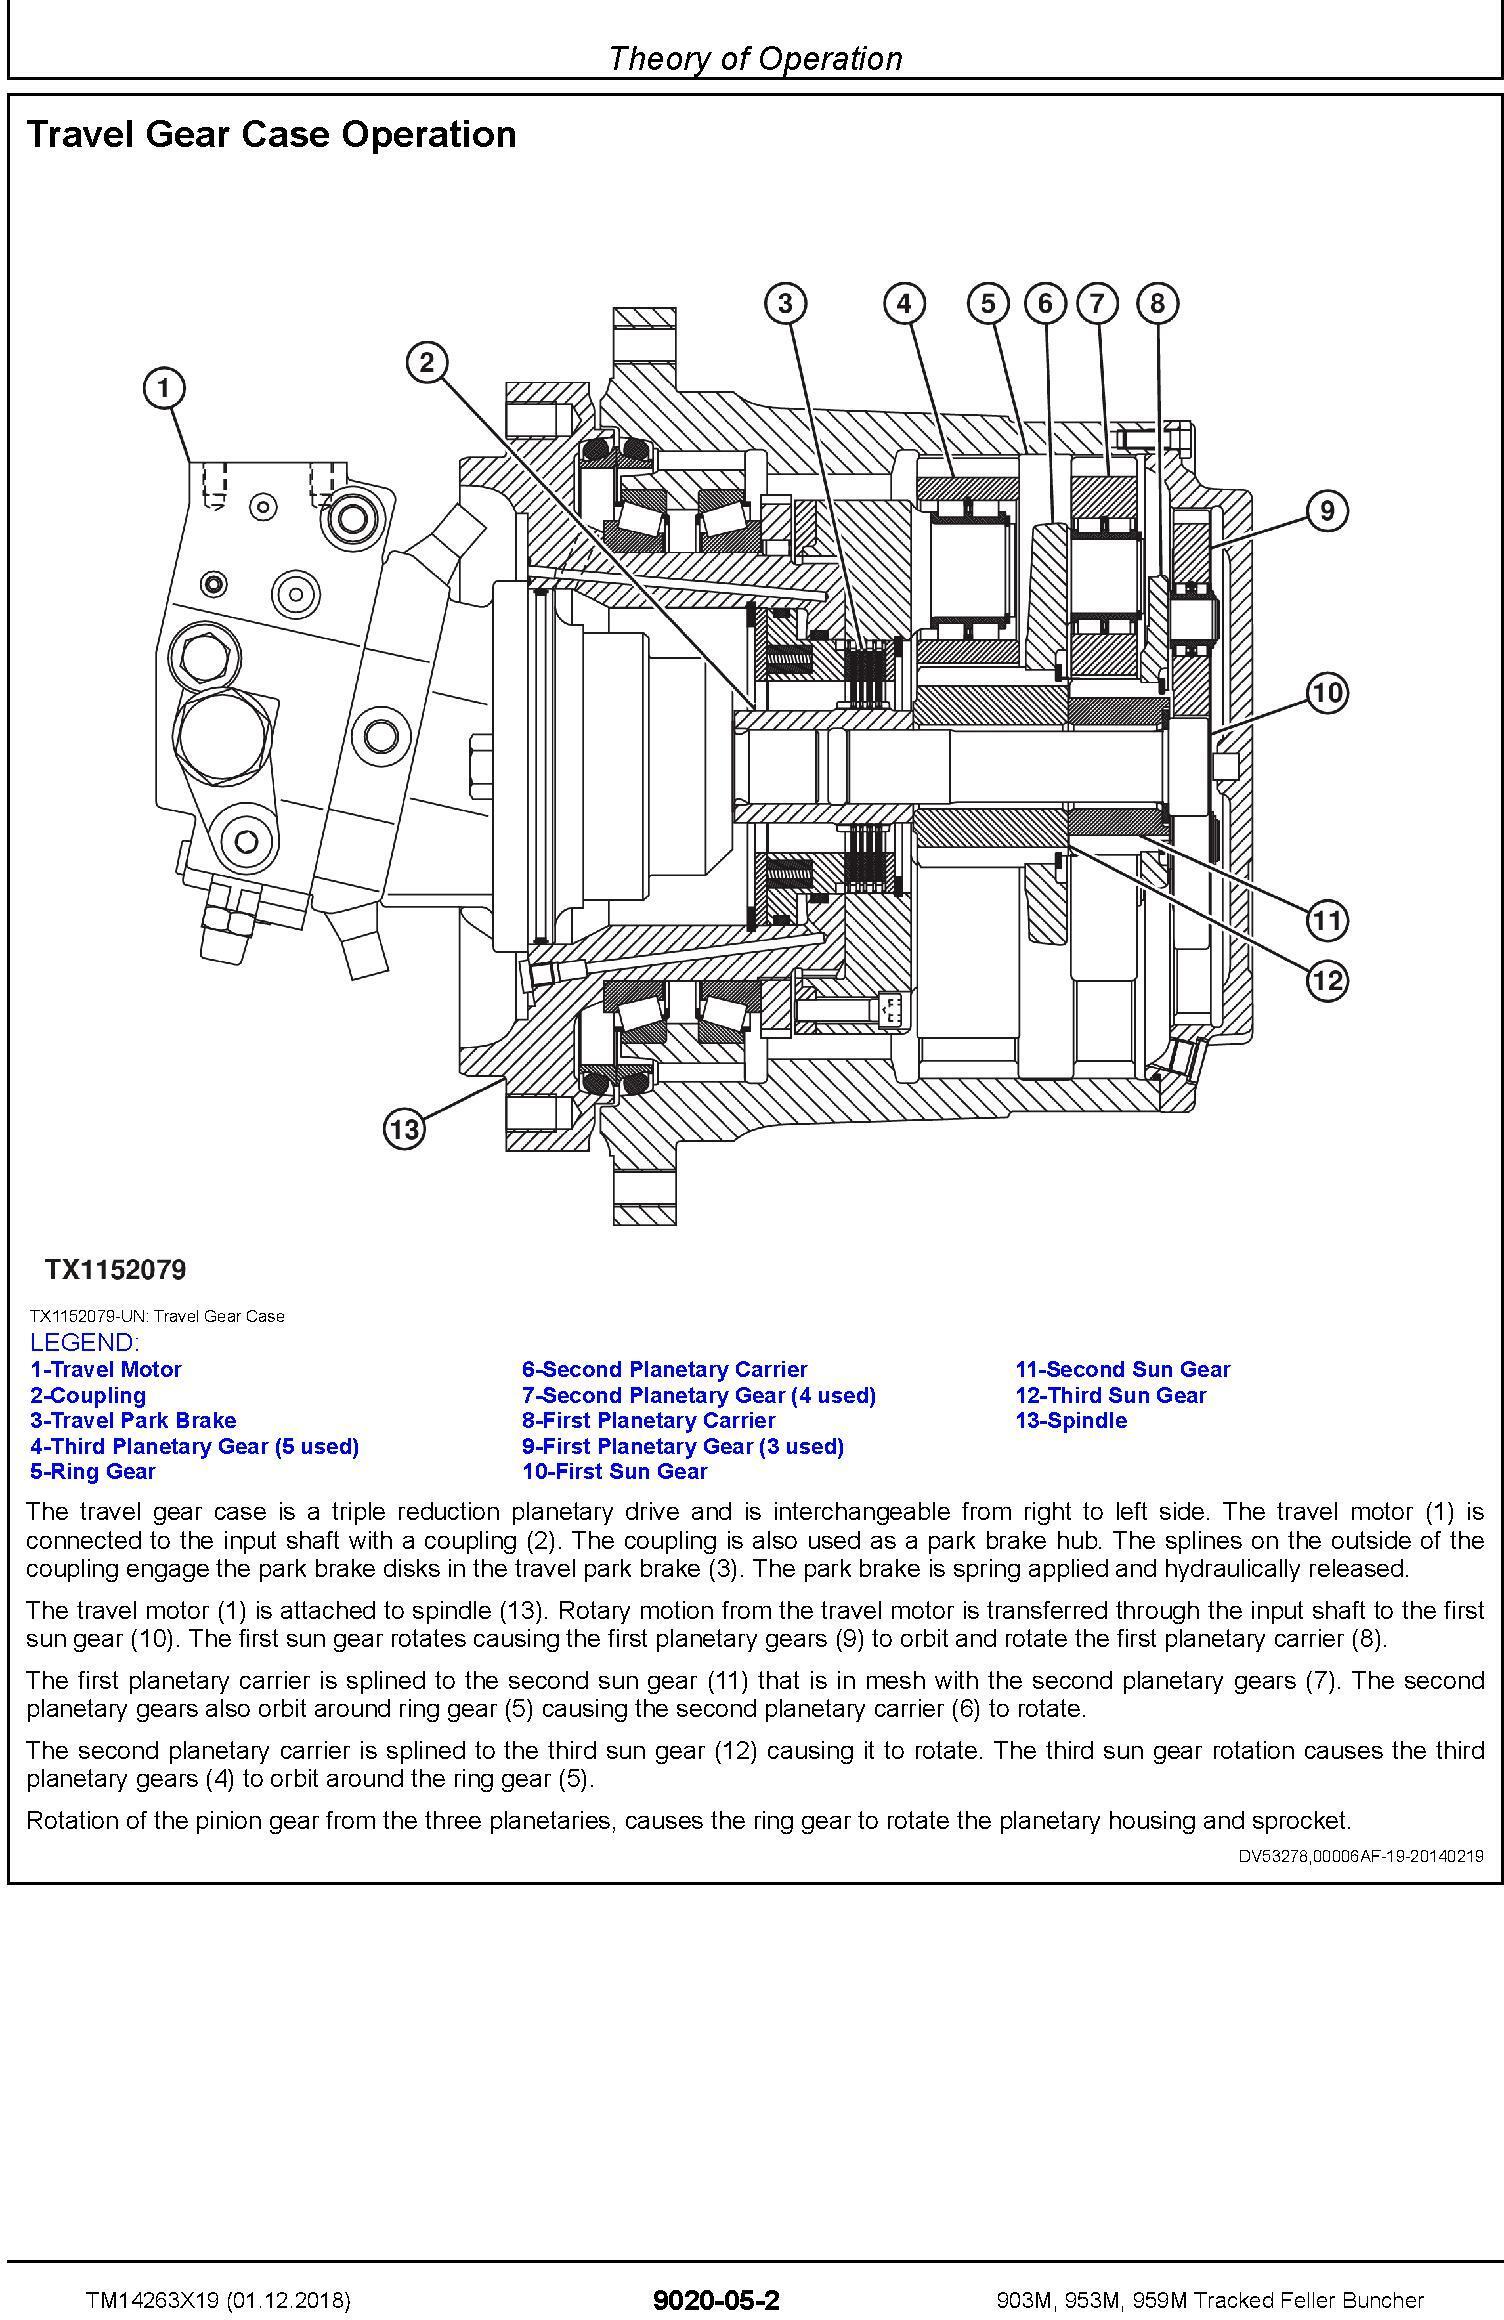 John Deere 903M,953M,959M (SN.C317982-,D317982-) Feller Buncher Diagnostic Service Manual TM14263X19 - 1